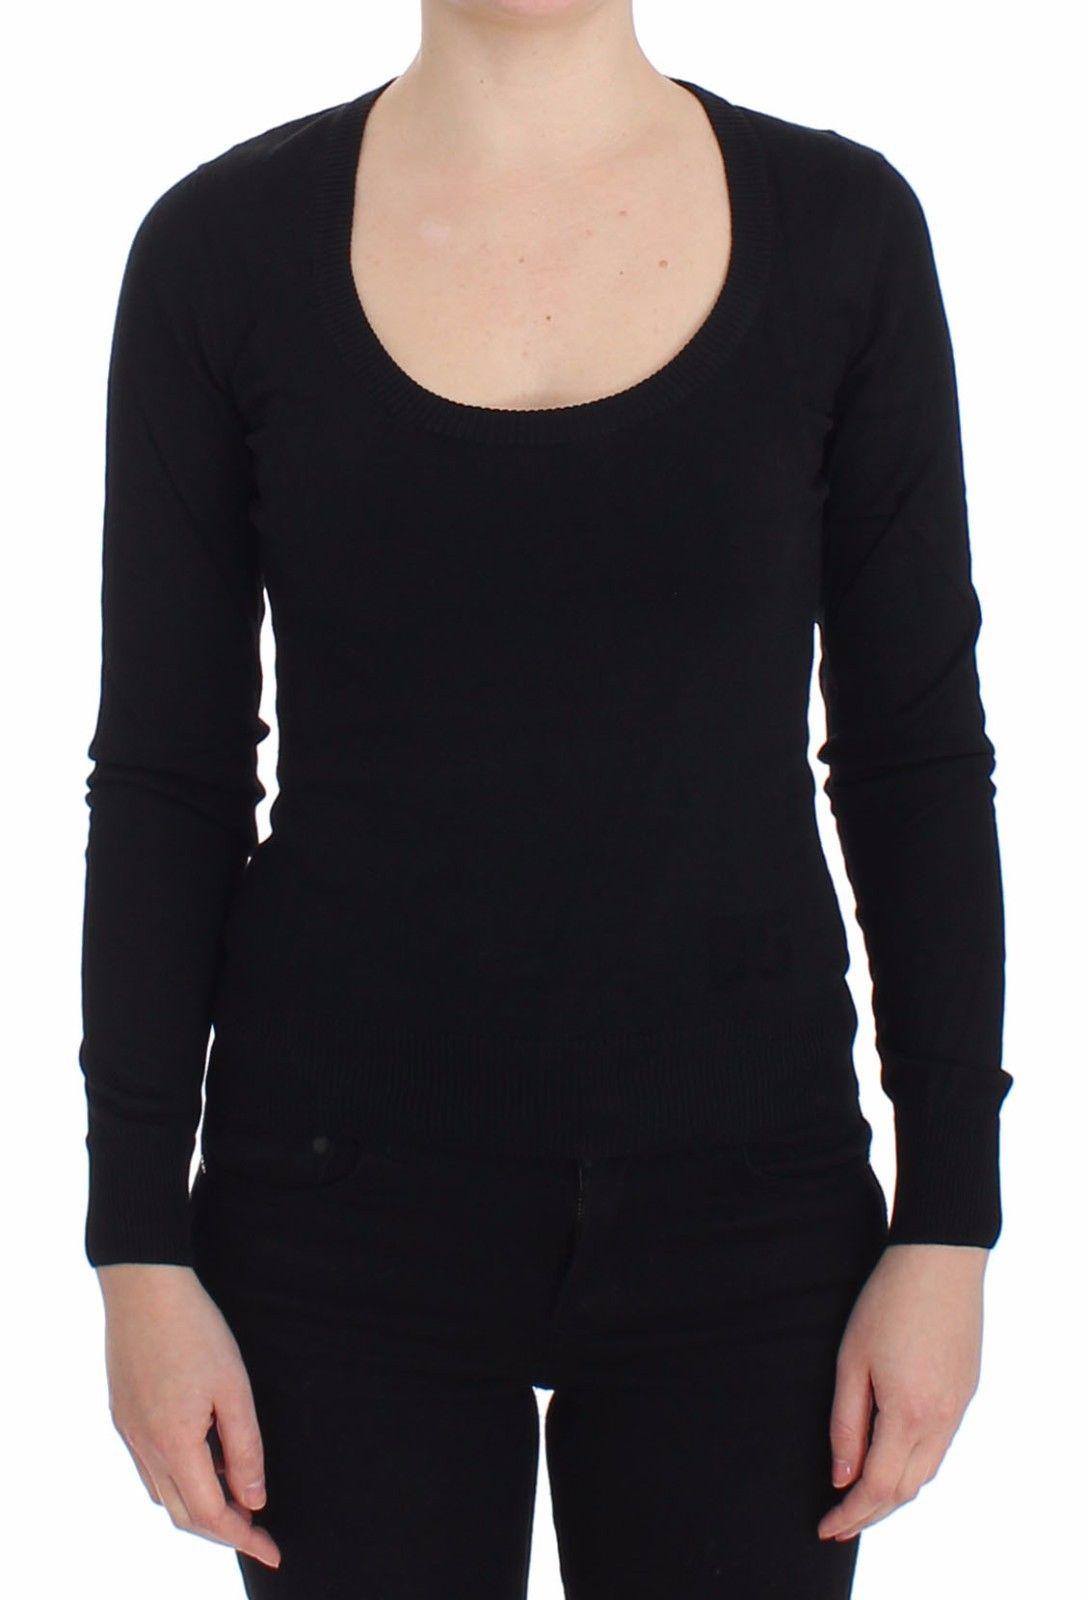 Dolce & Gabbana Women's Cashmere Crewneck Pullover Sweater Black SIG13363-3 - IT42|M